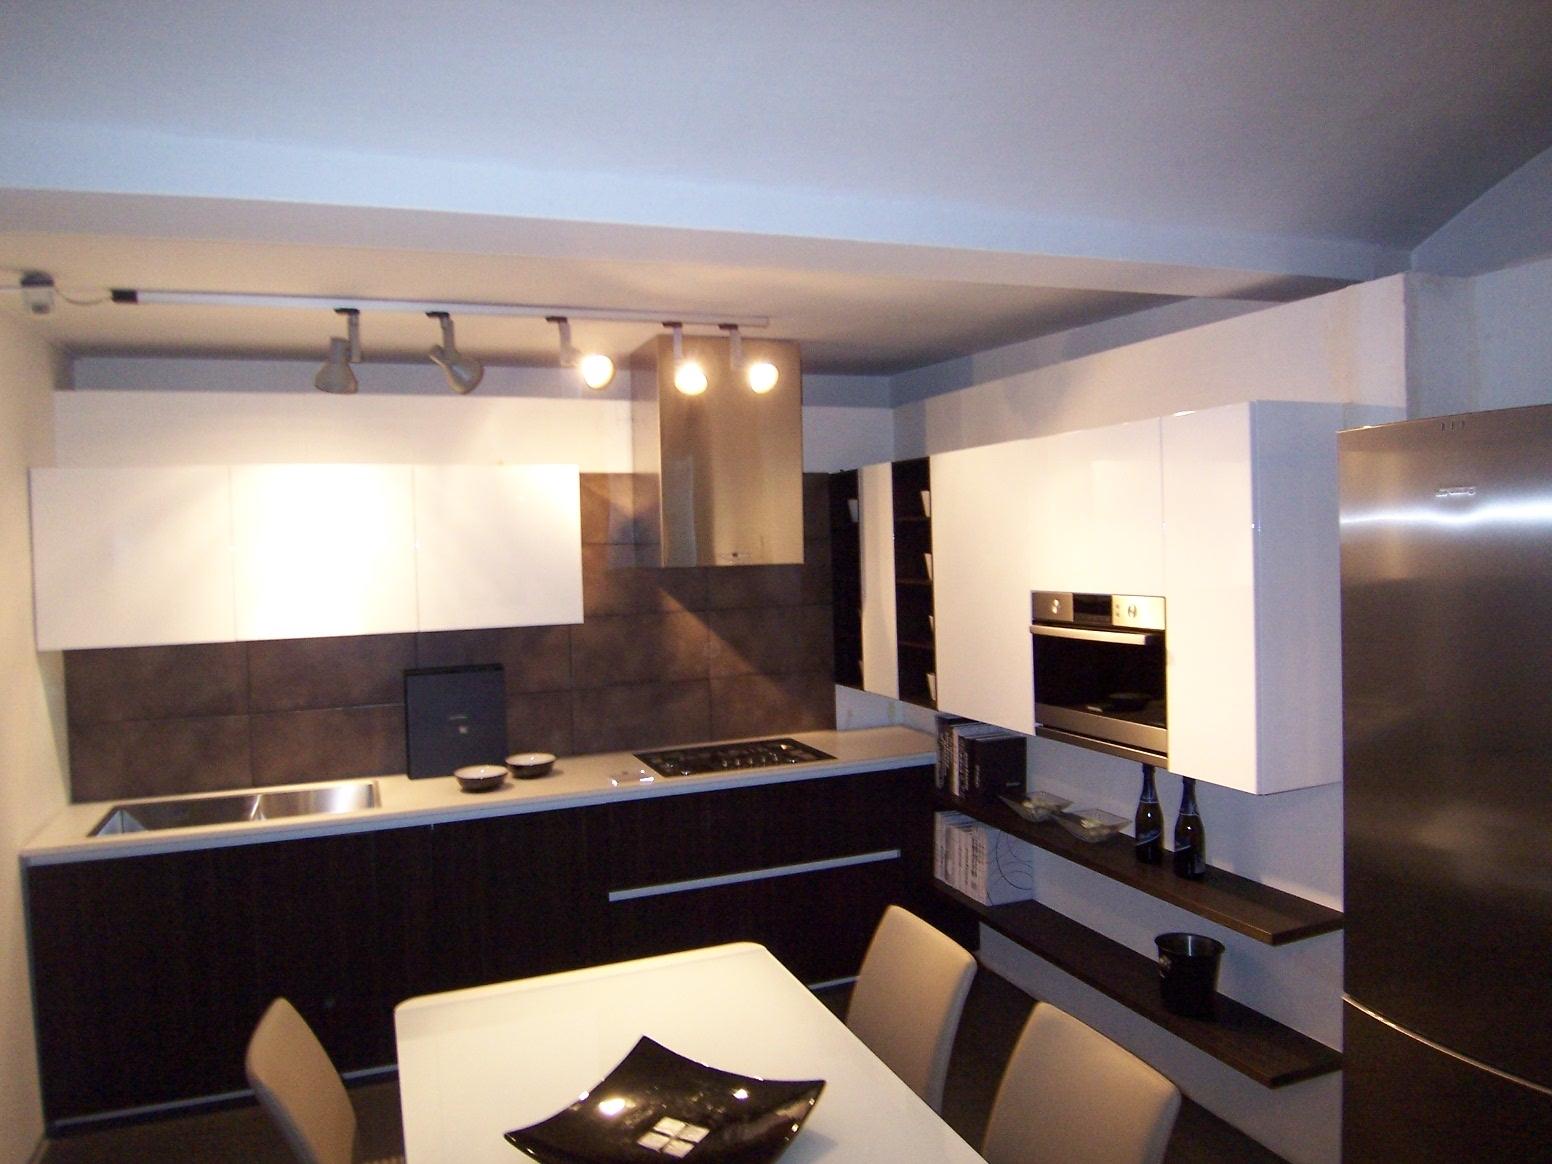 Marche Di Cucine Moderne. Tipologie Di Cucine With Marche Di ...